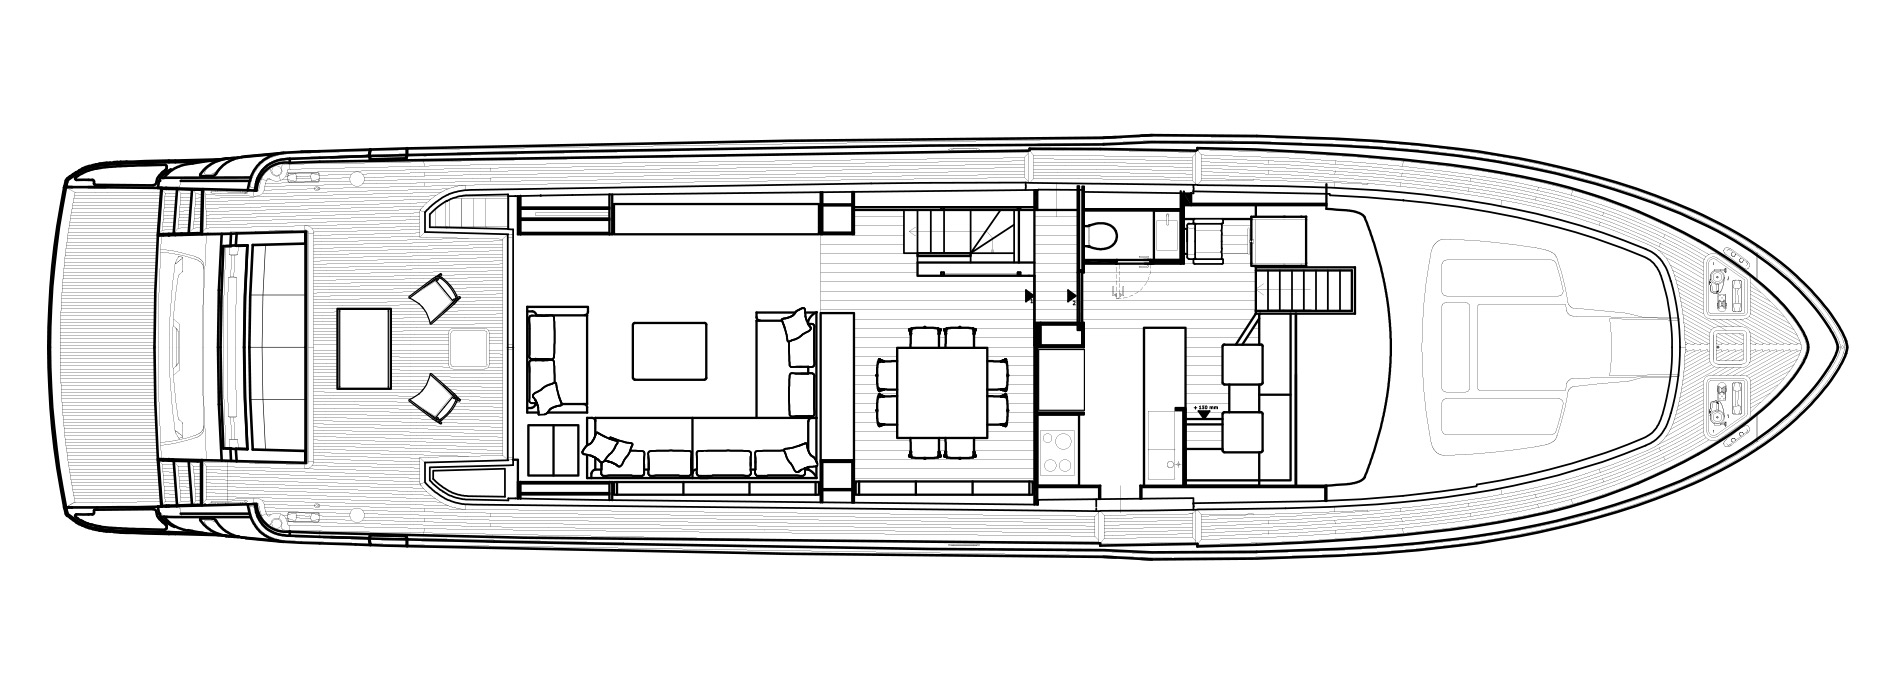 Sanlorenzo Yachts SL86 Главная палуба версия USA